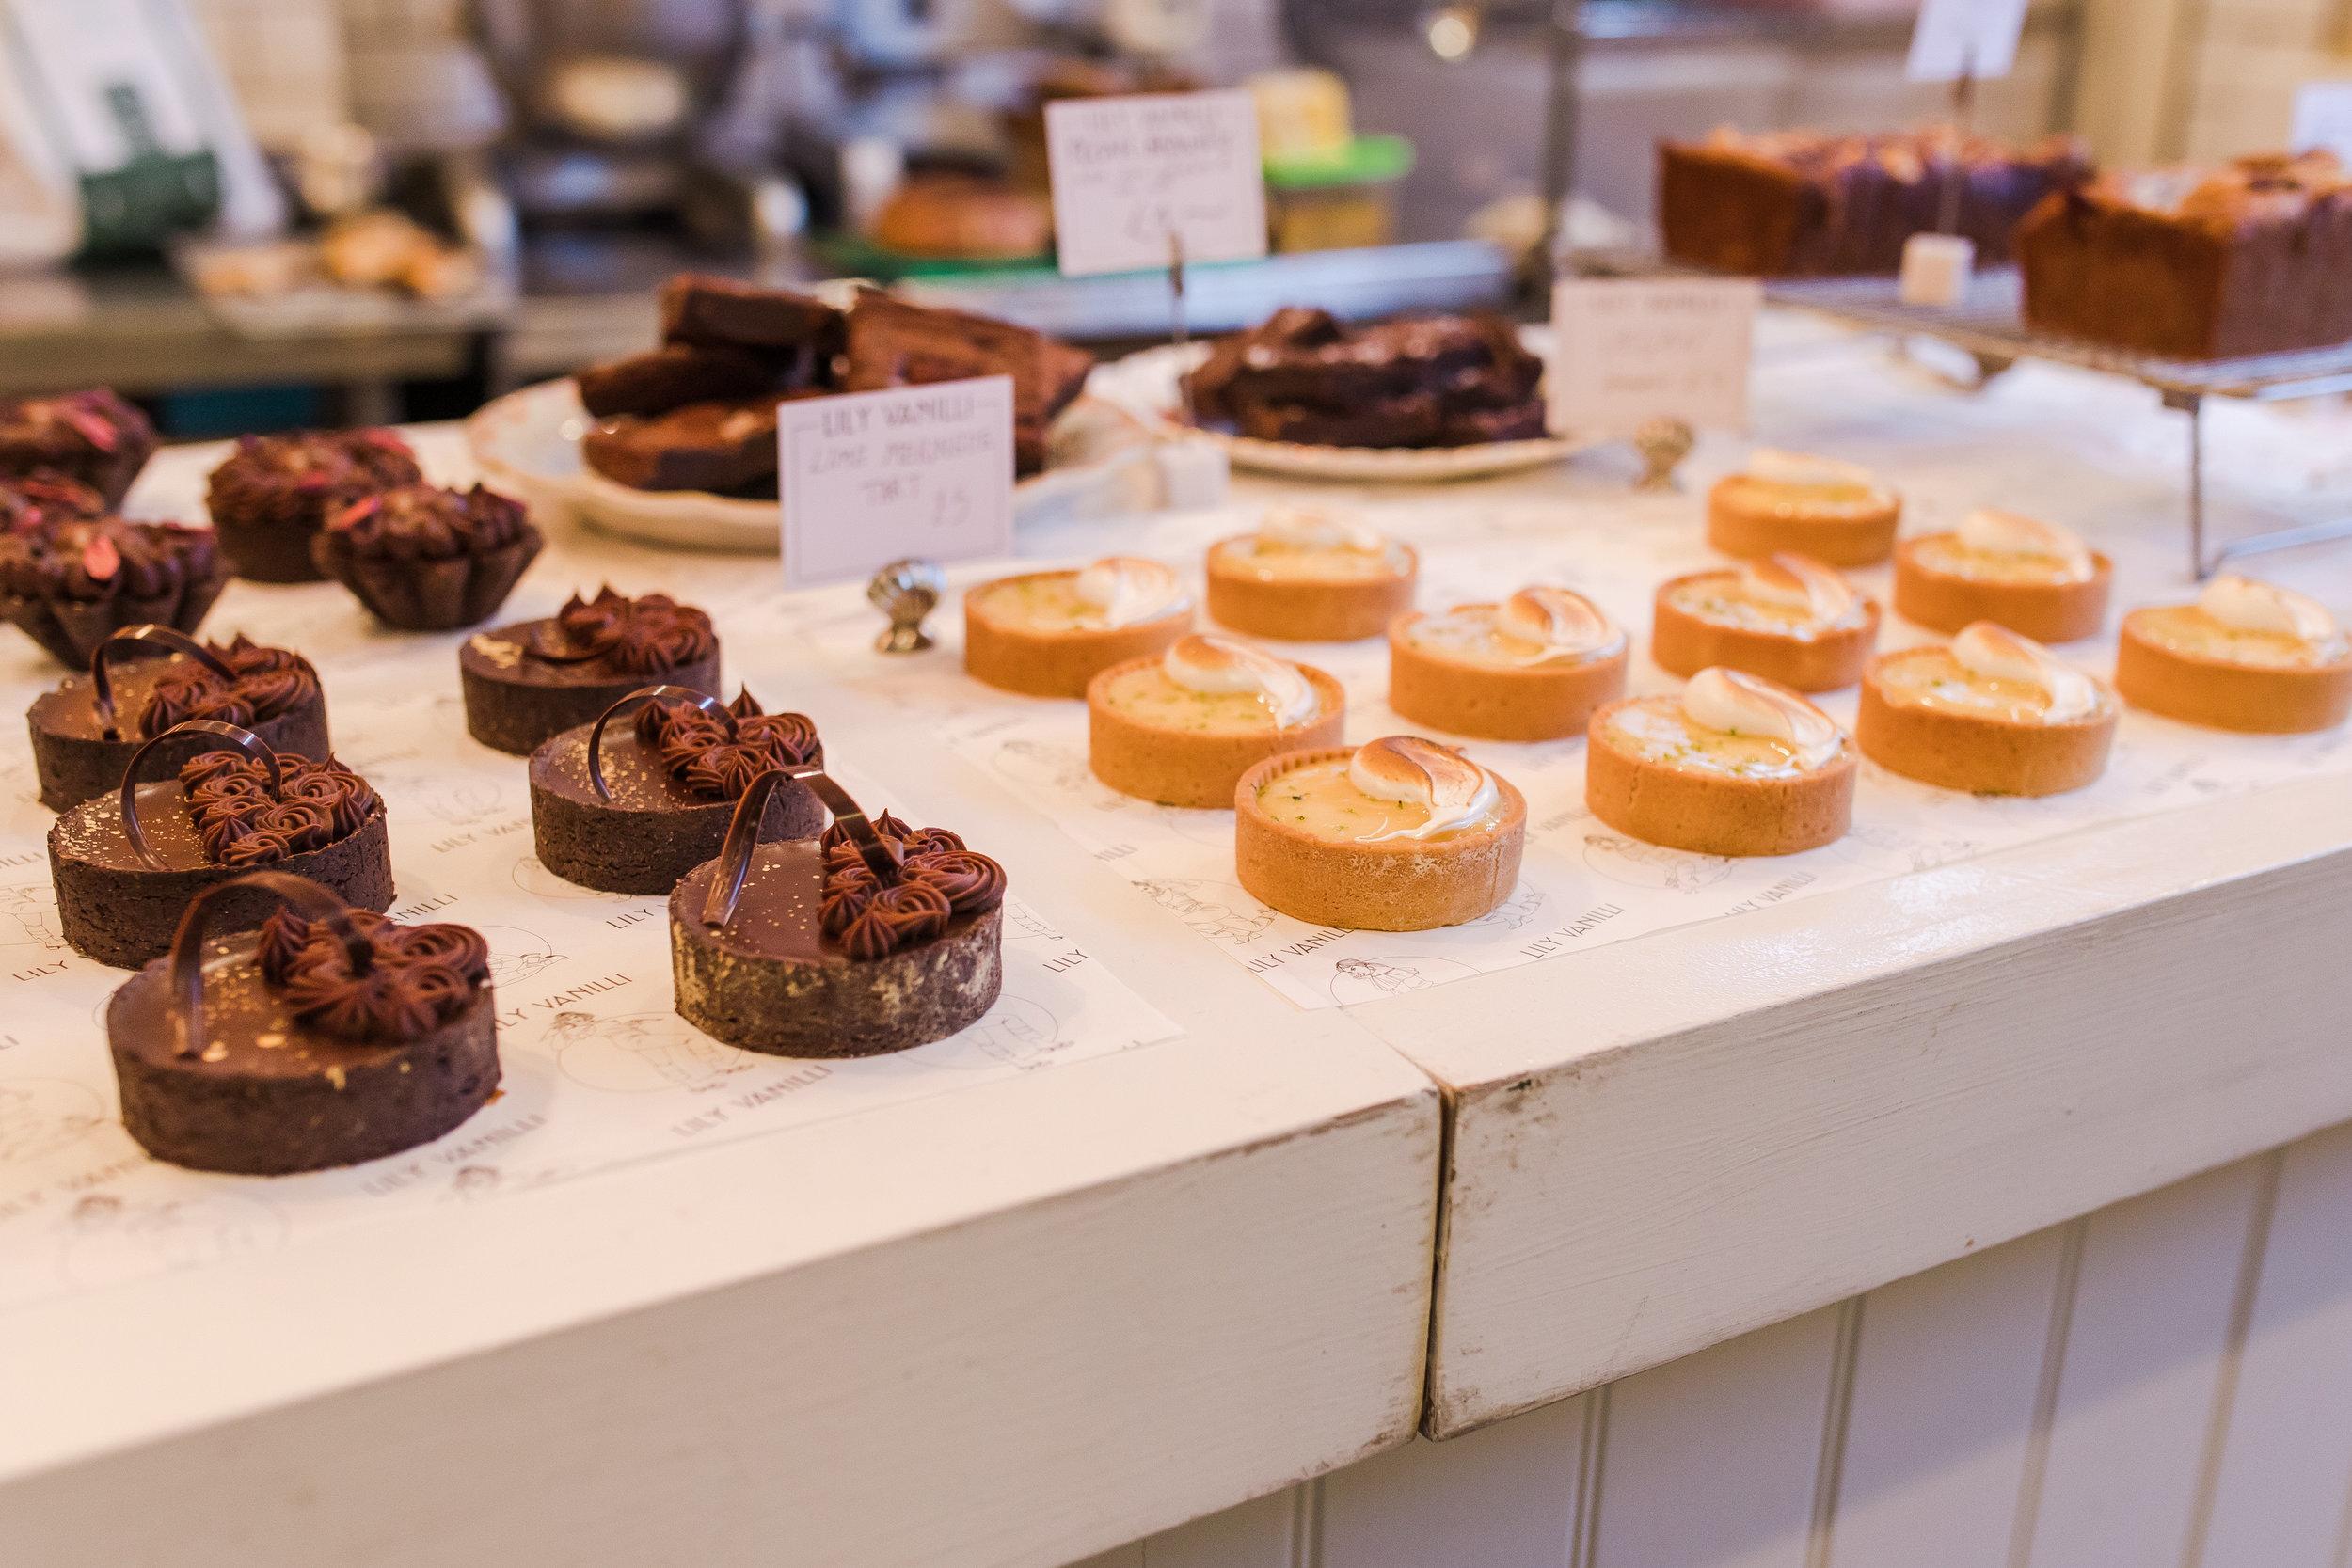 Lily Vanilli Cafe Pastries Close Upjpg.jpg